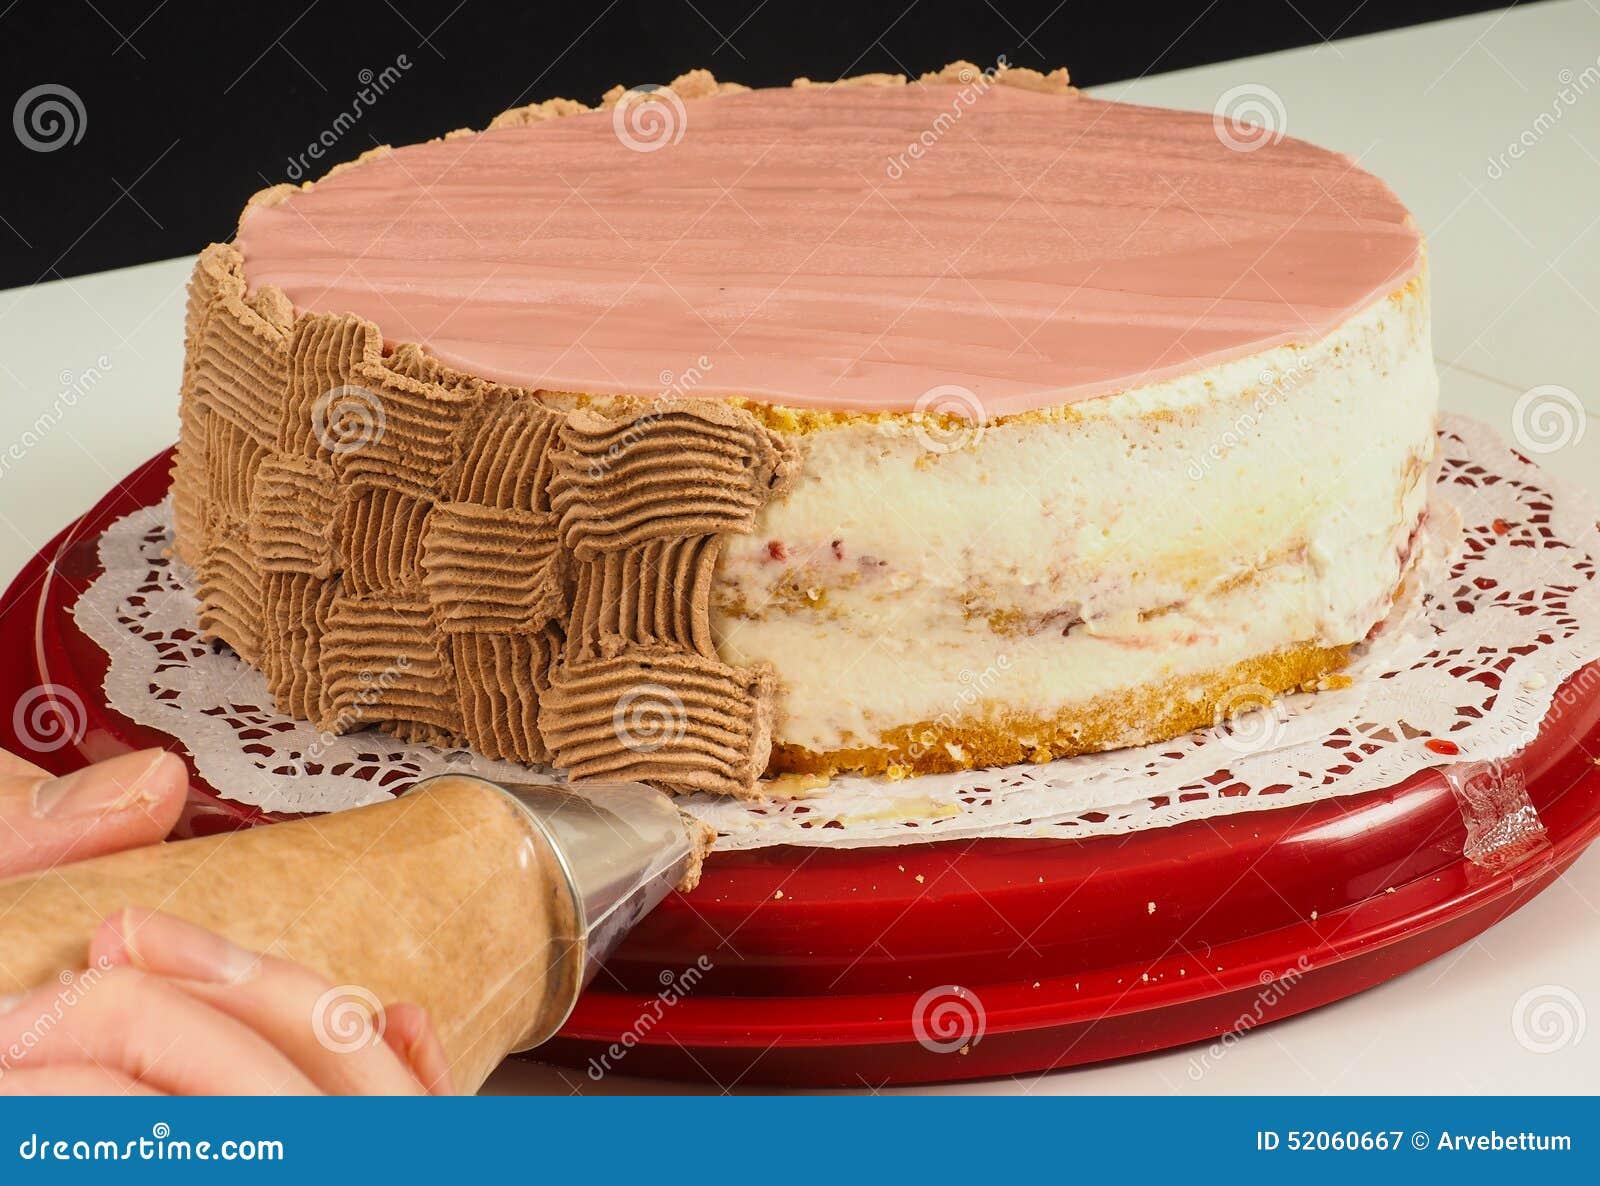 Crema aflautada del chocolate del panadero profesional de la torta sobre la torta